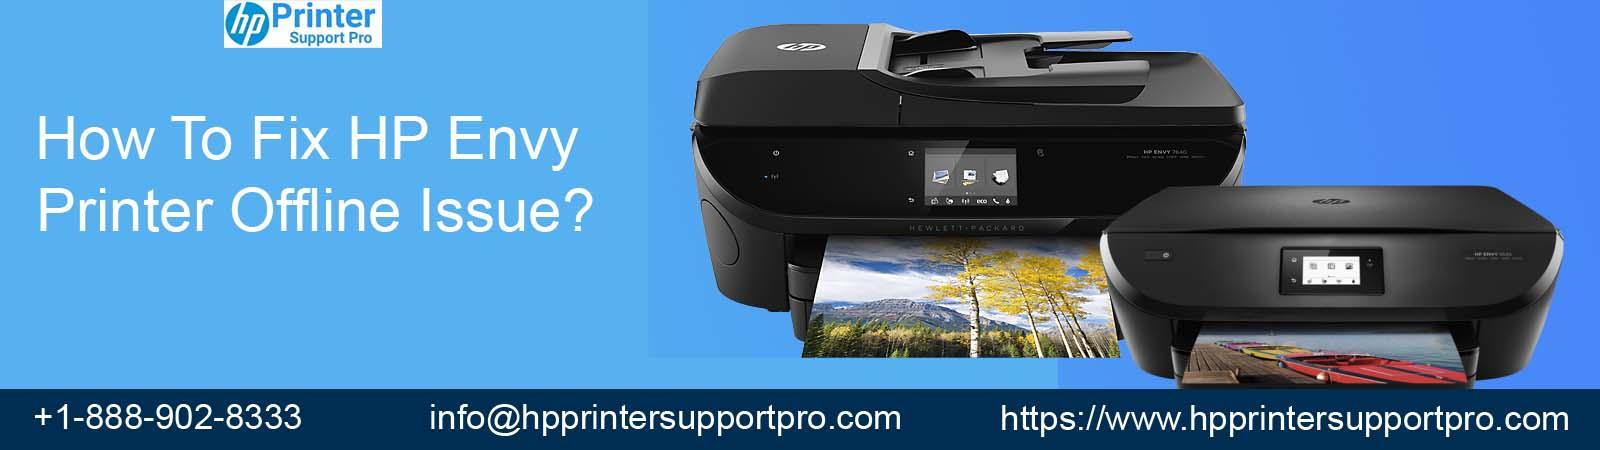 Fix HP Envy Printer Offline Issue call 1-888-902-8333